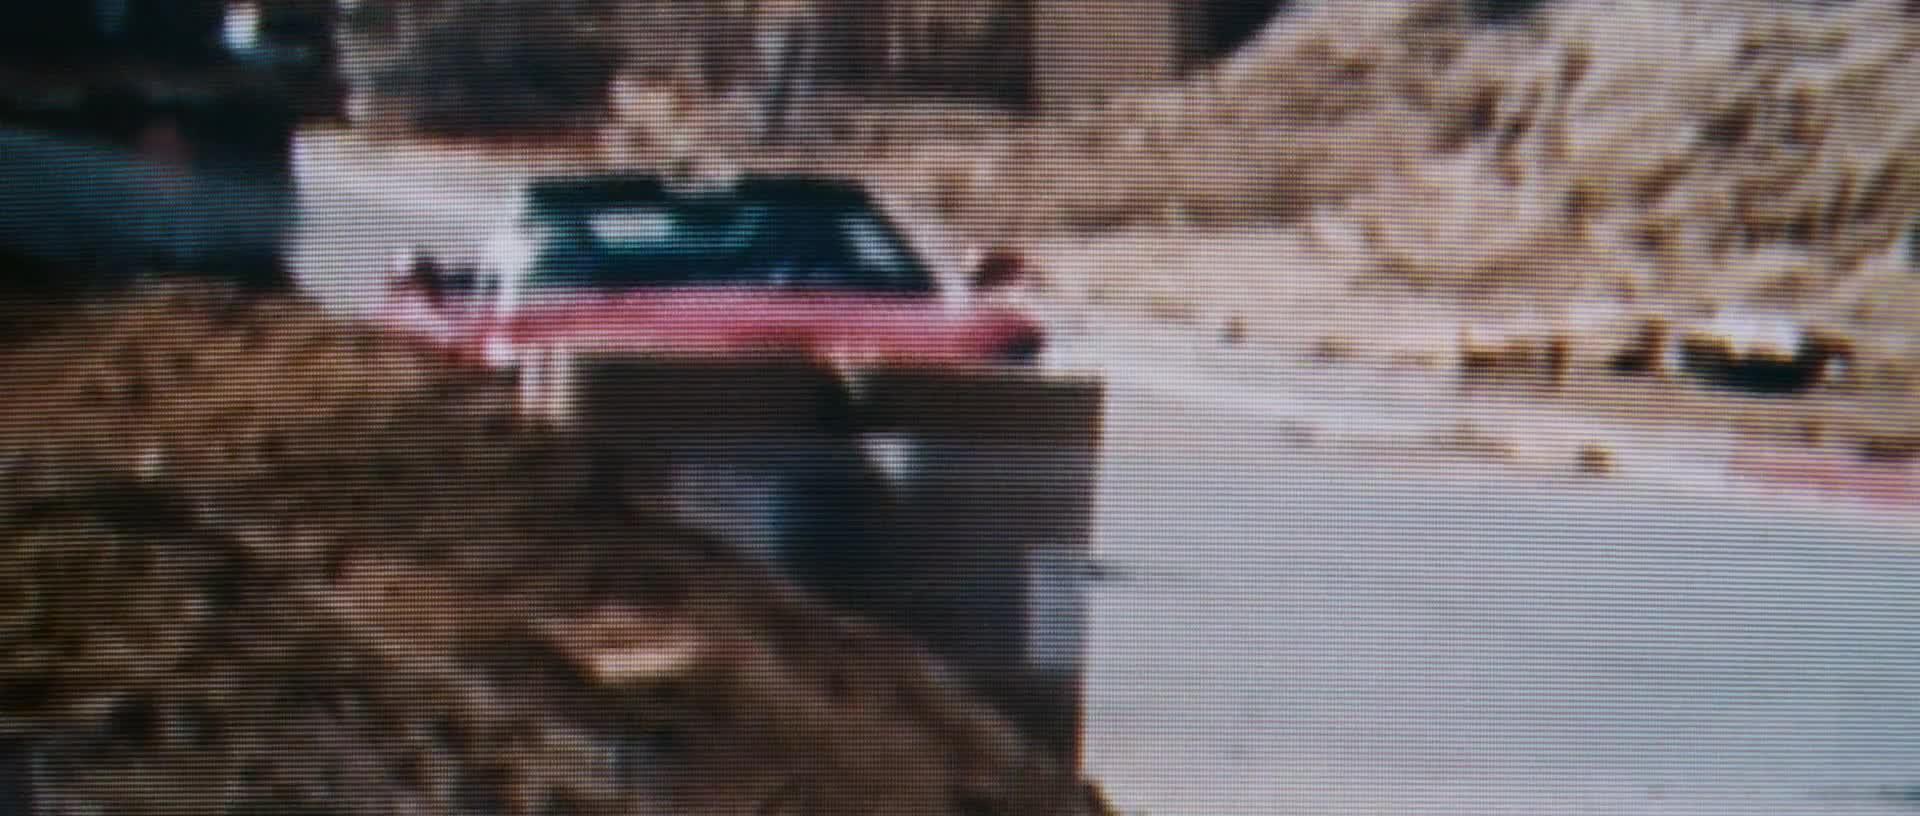 The Fast and the Furious Tokyo Drift เร็วแรงทะลุนรก ซิ่งแหกพิกัดโตเกียว (2006)